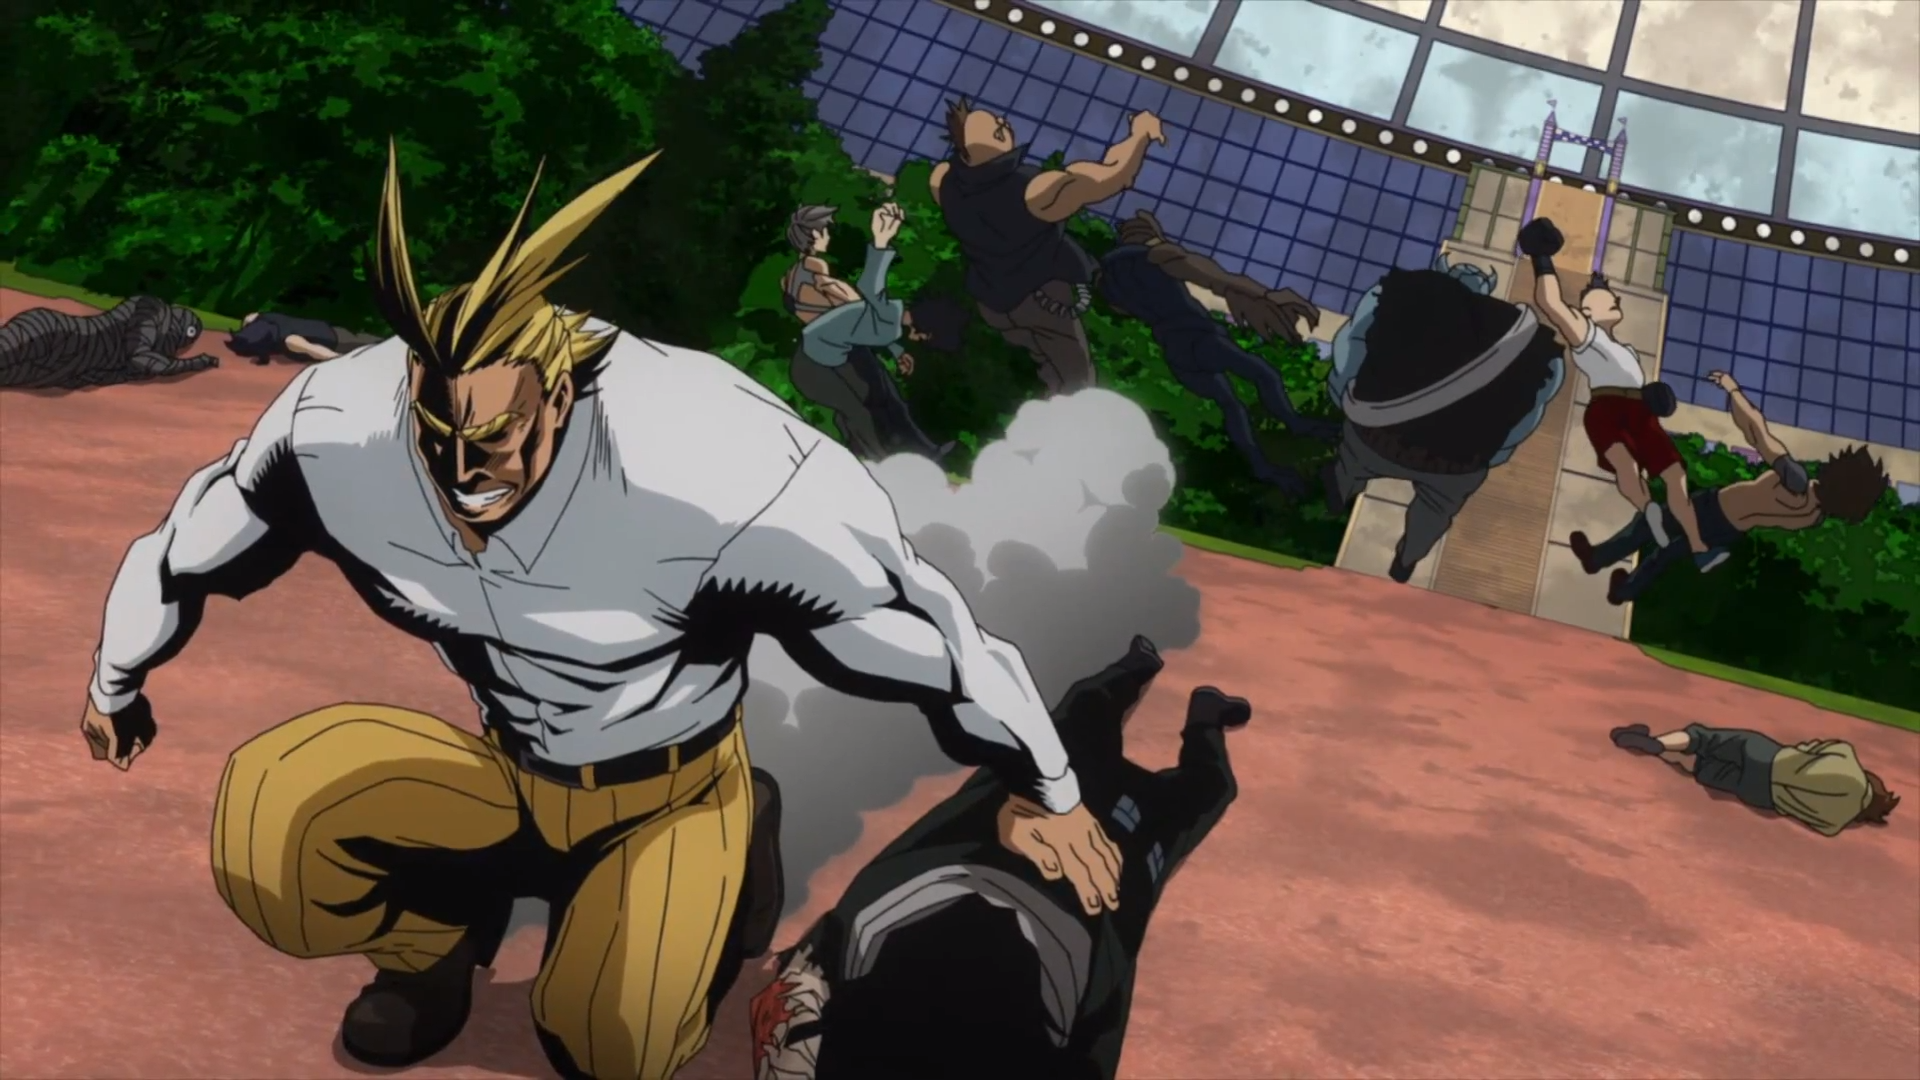 Toshinori Yagi & U.A. Students vs. League of Villains